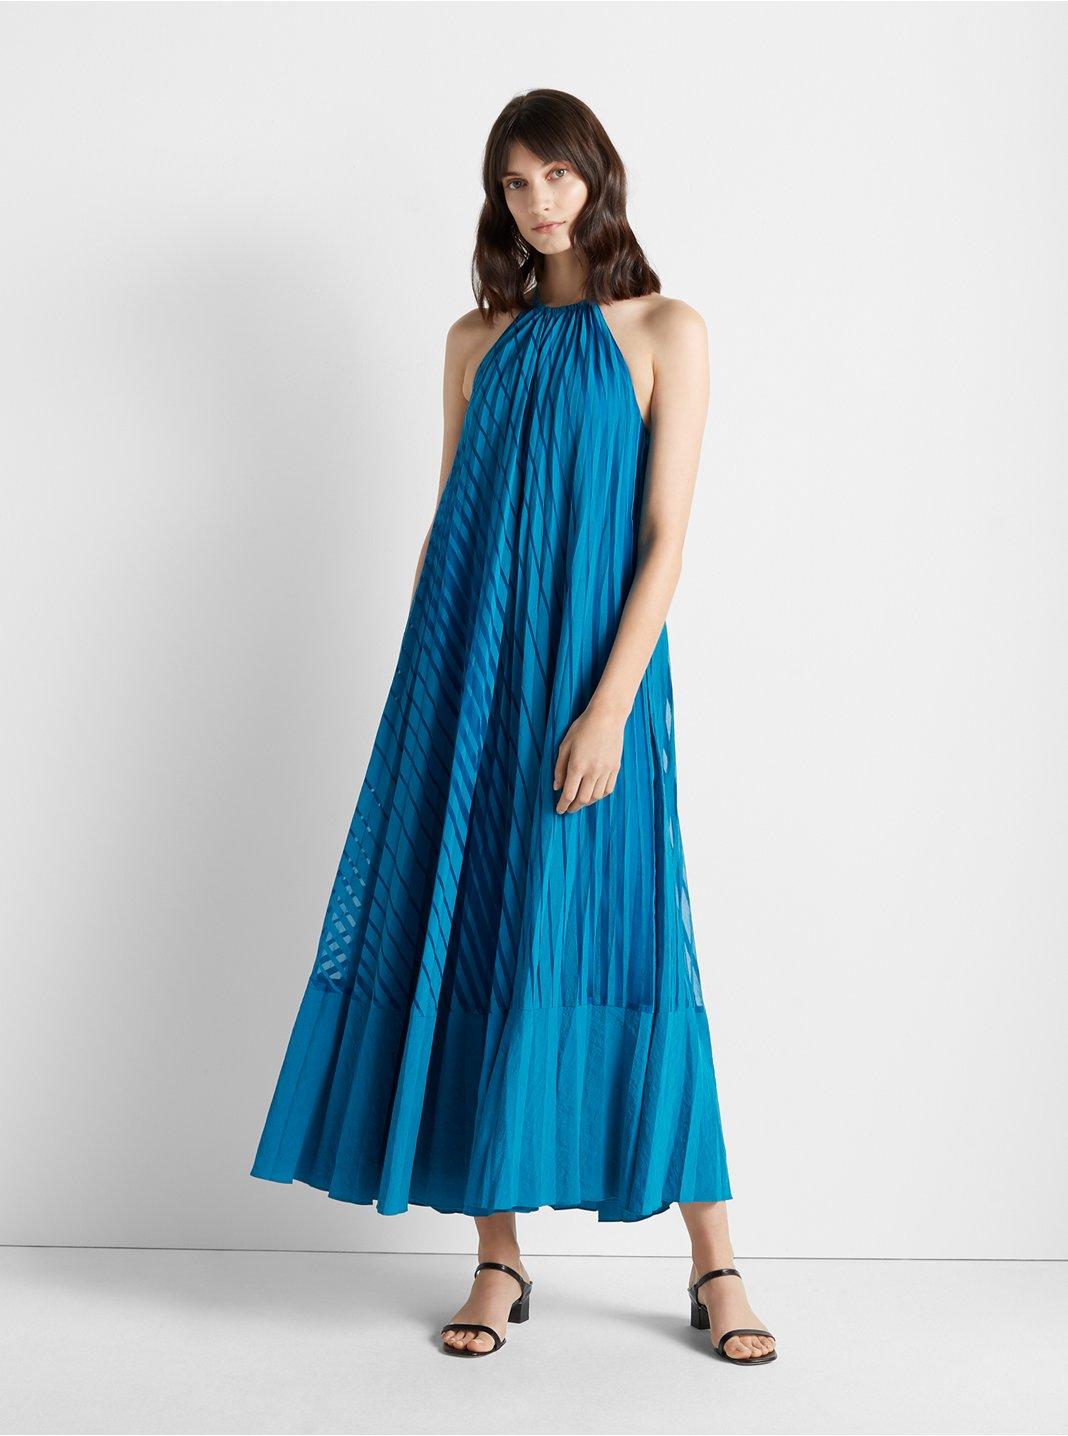 Burnout Pleated Maxi Dress